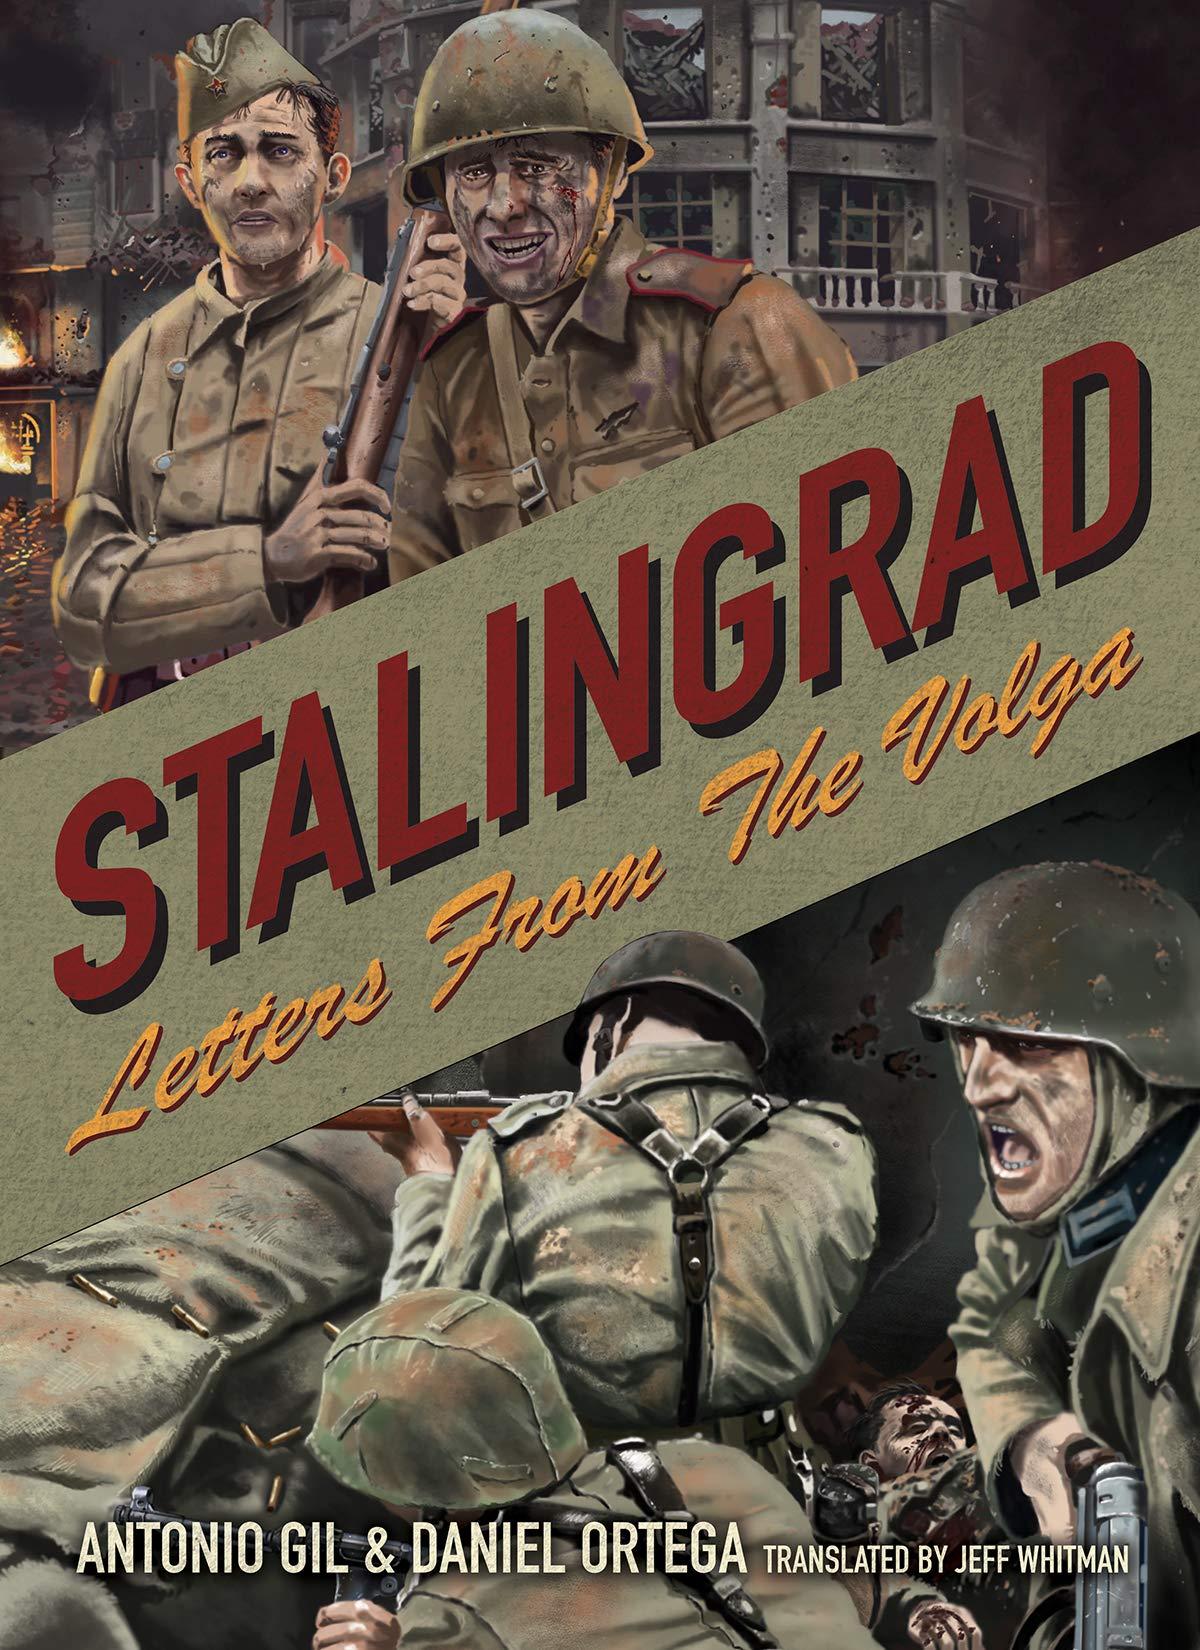 Stalingrad: Letters From Volga